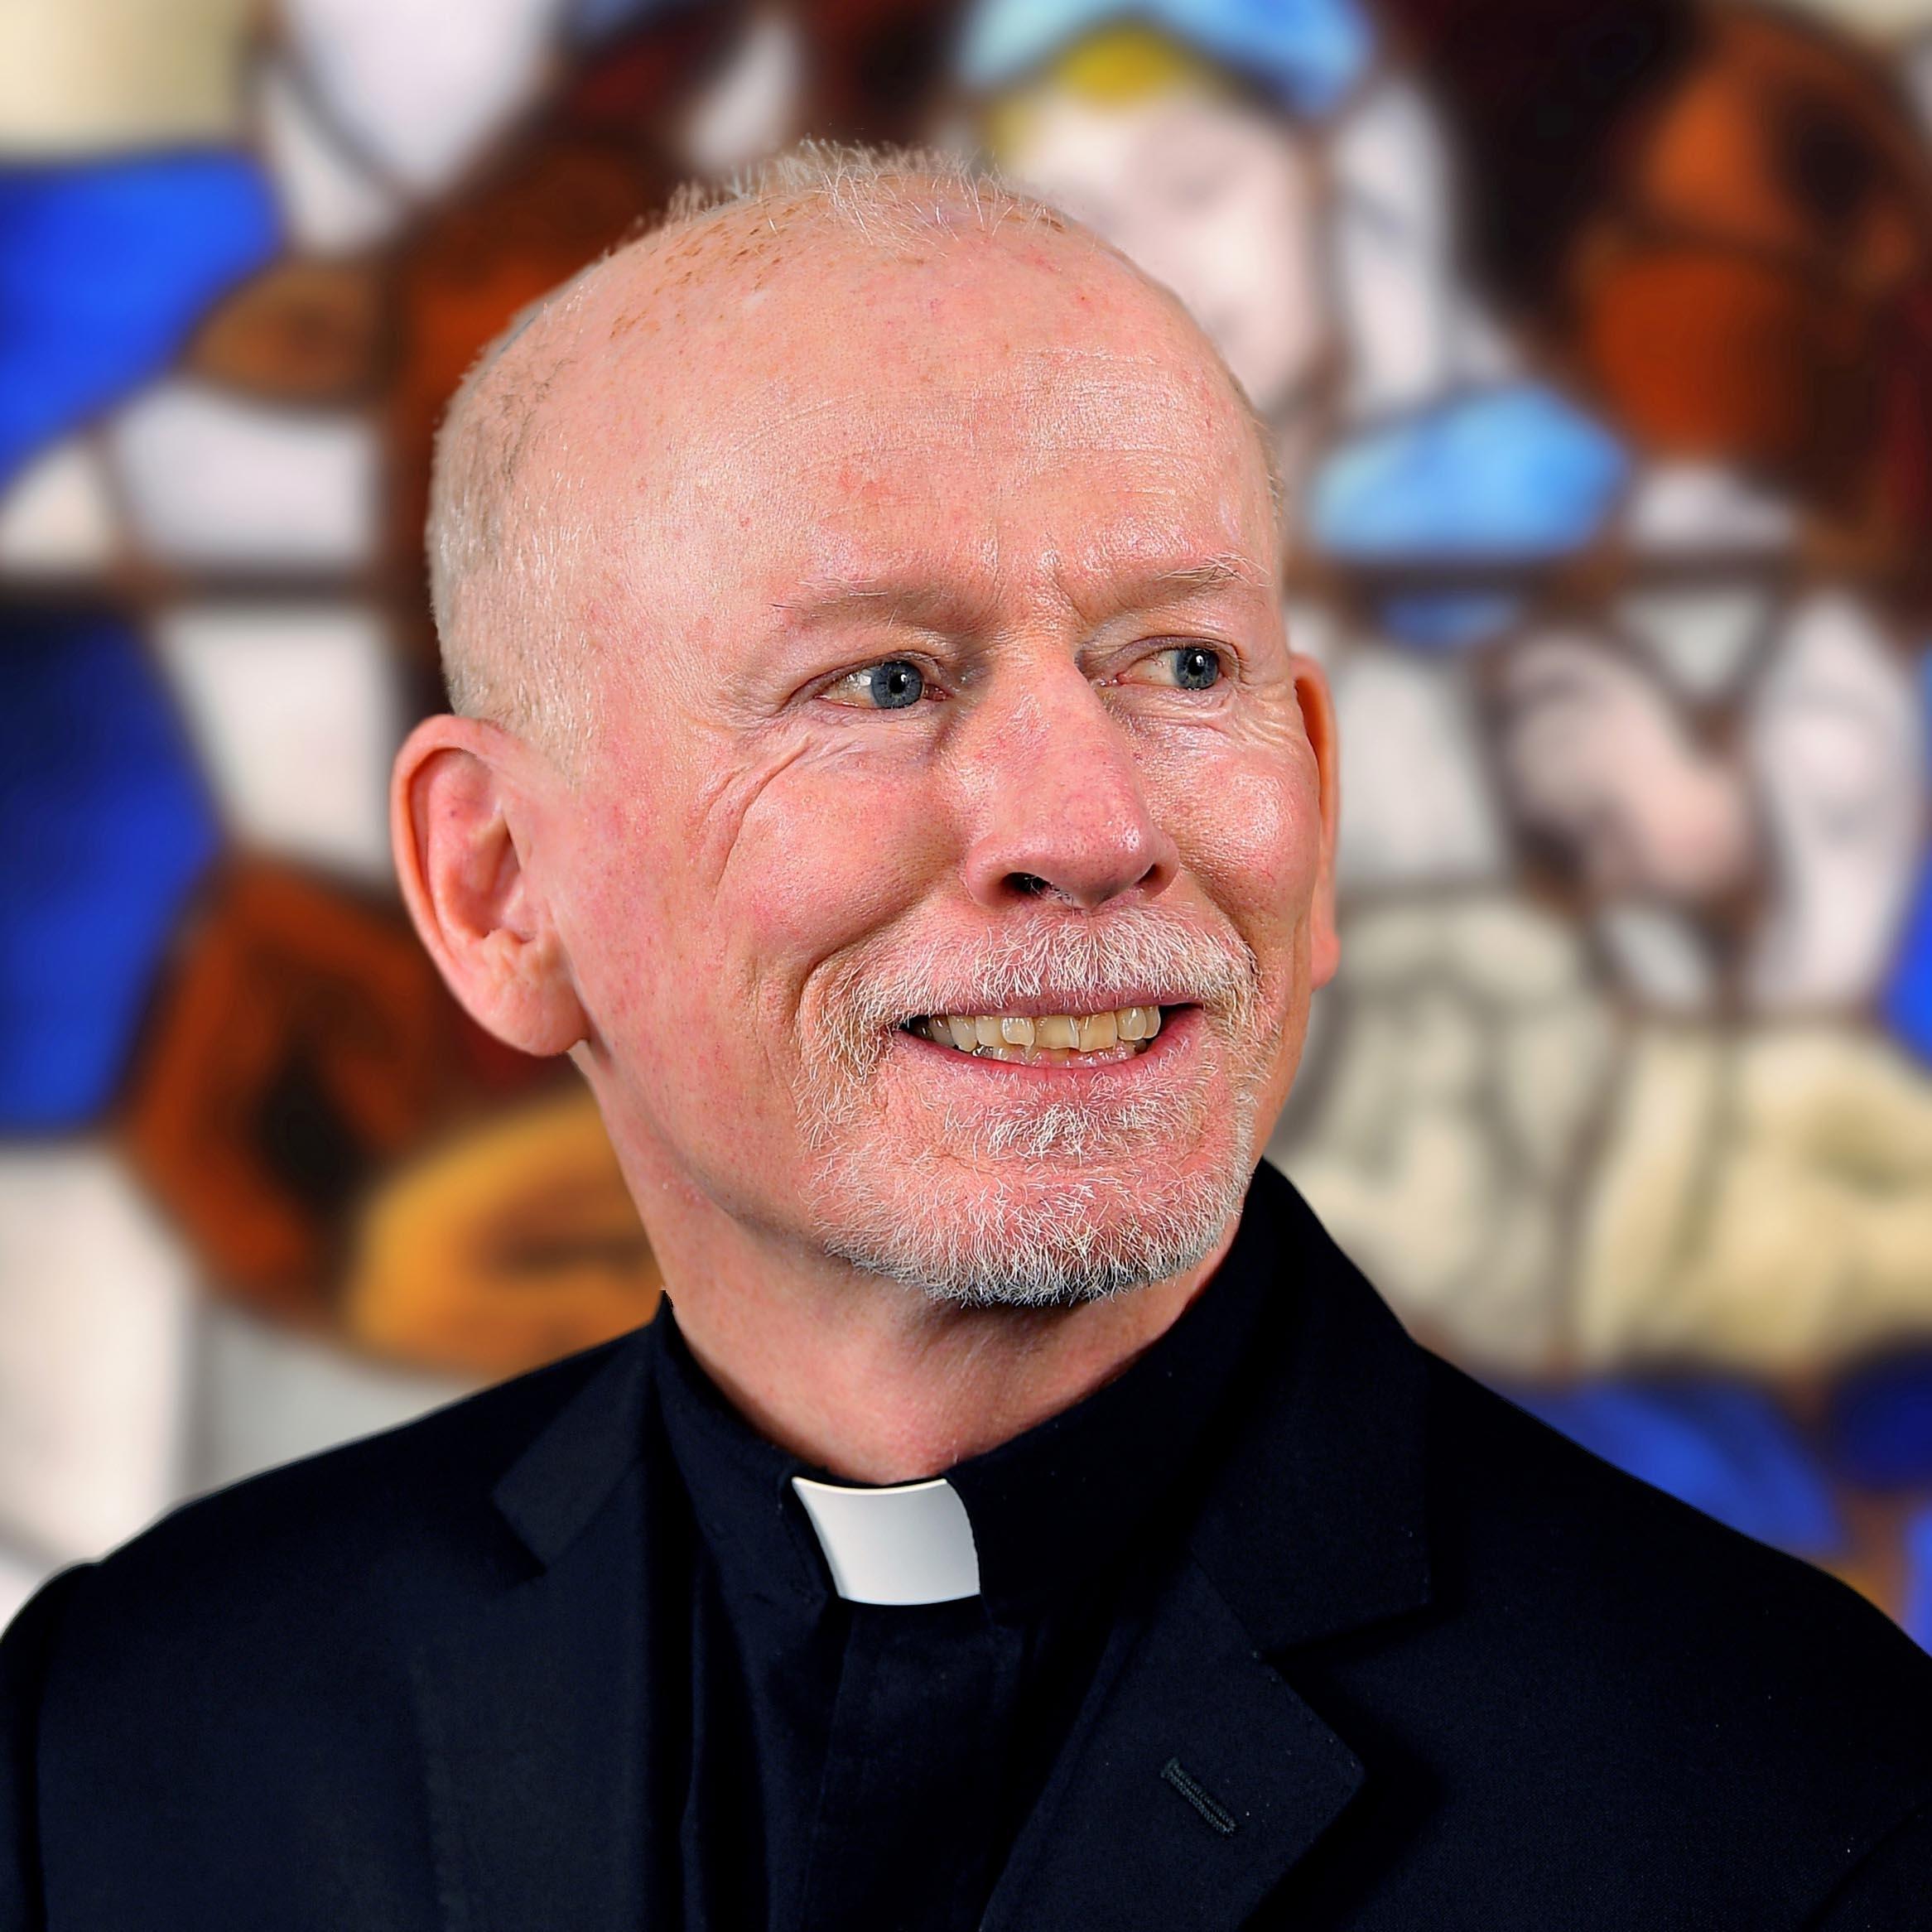 Rev. Brian J. Shanley